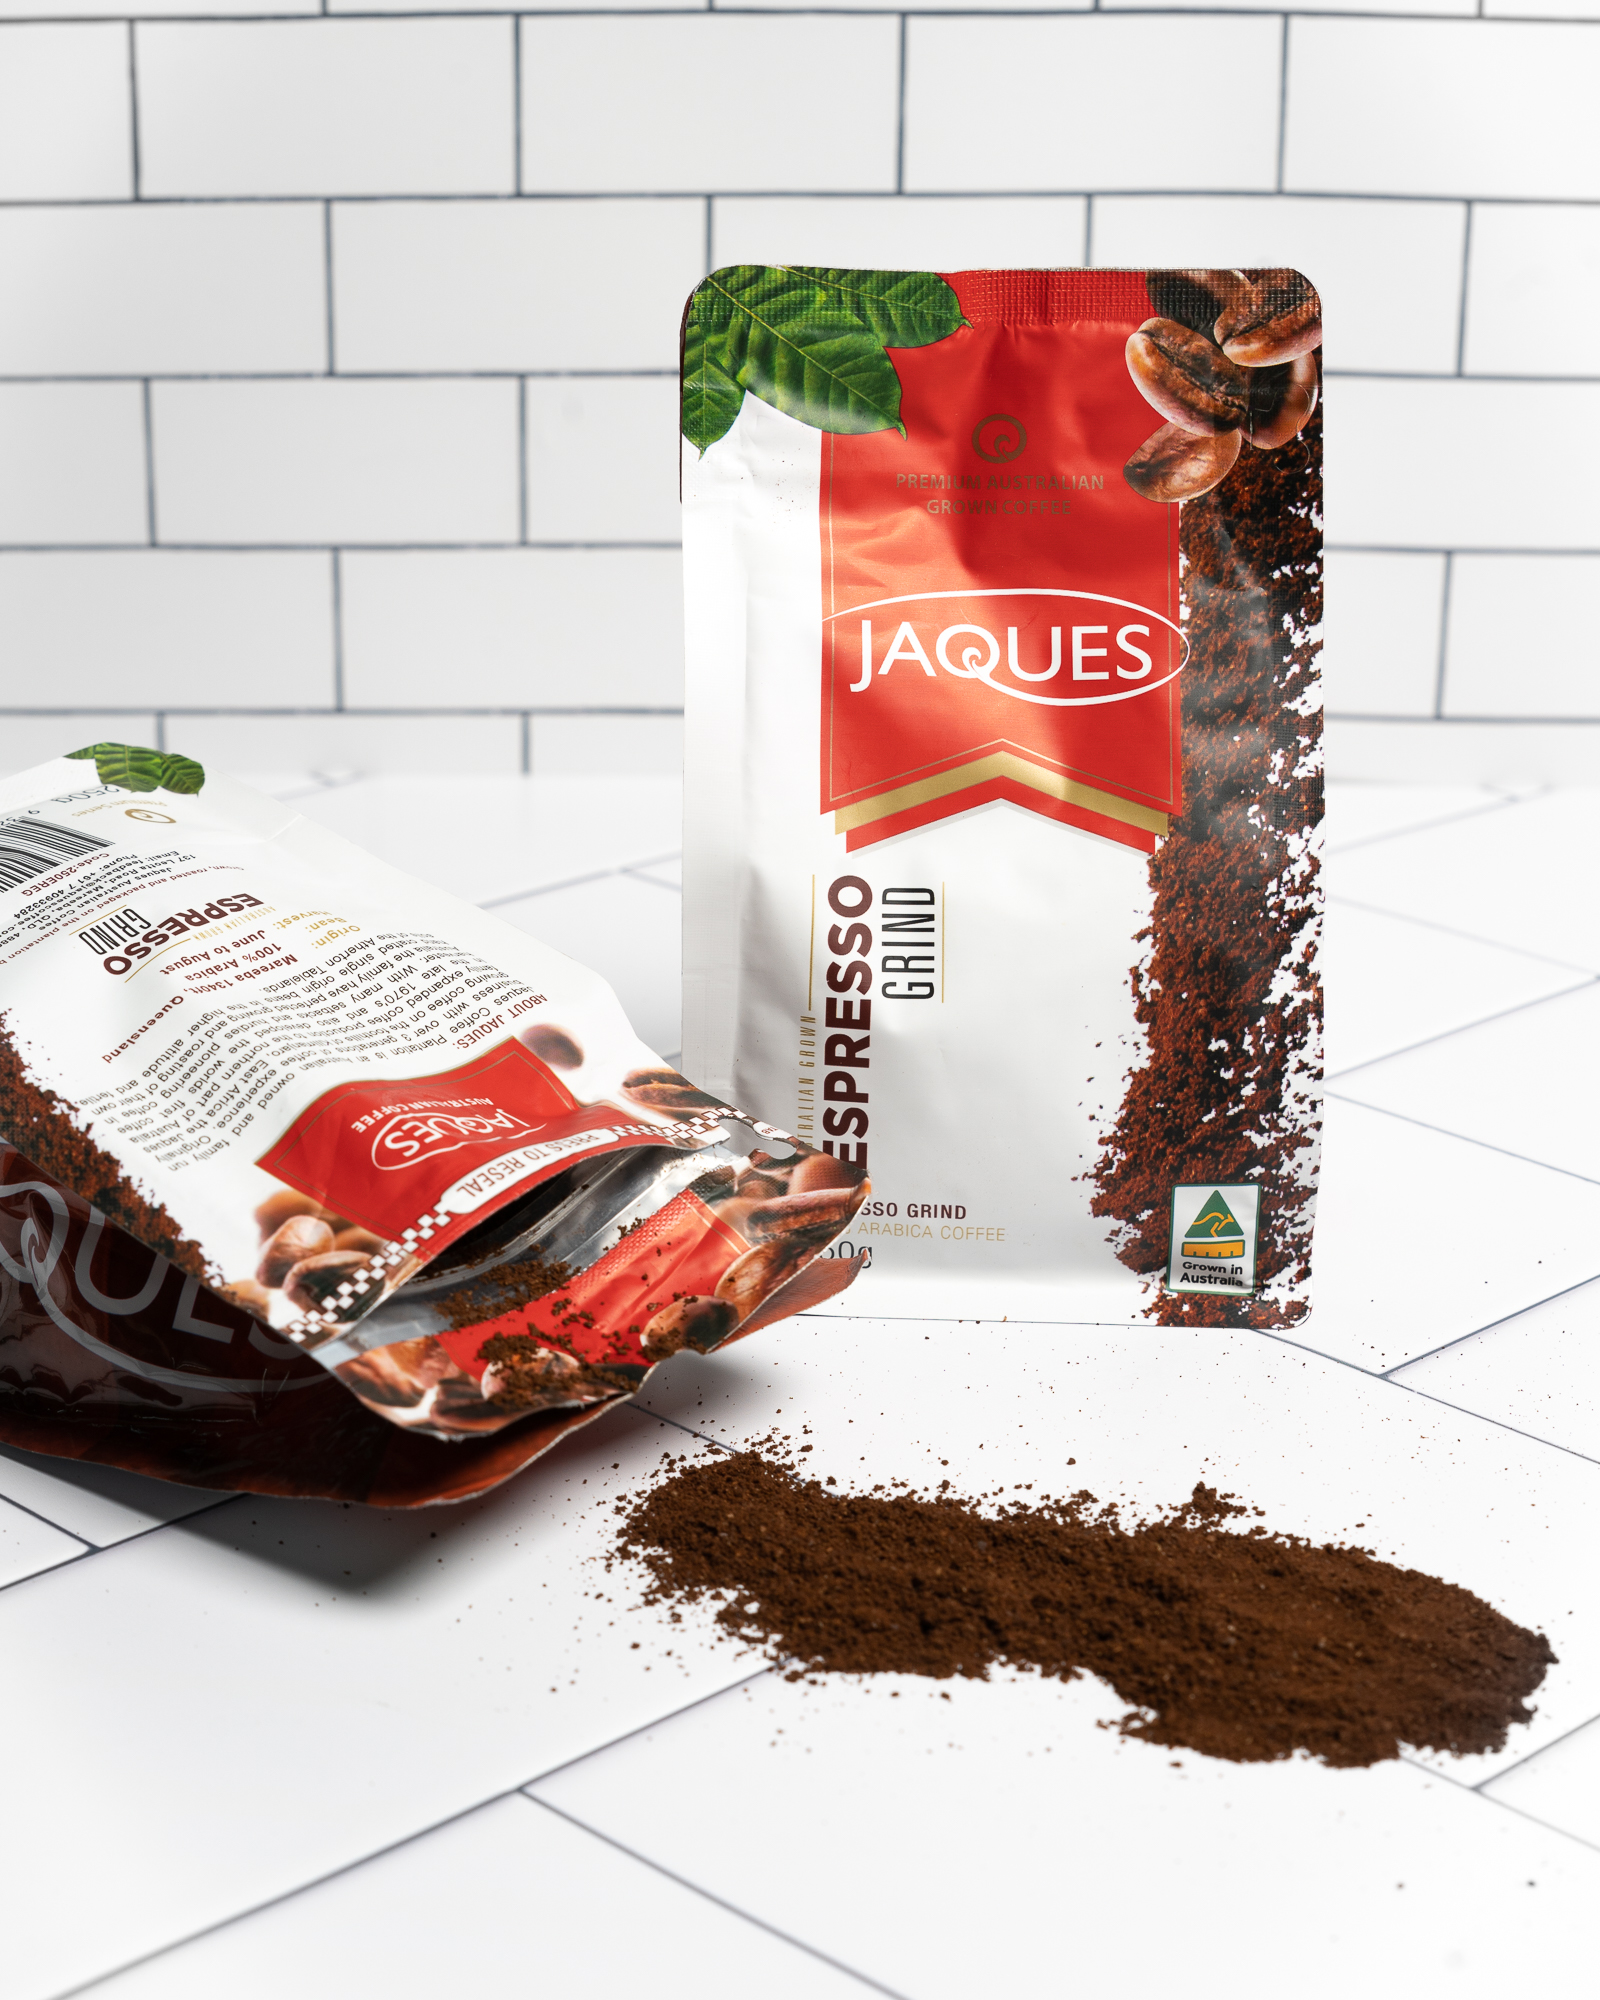 JAQUES COFFEE